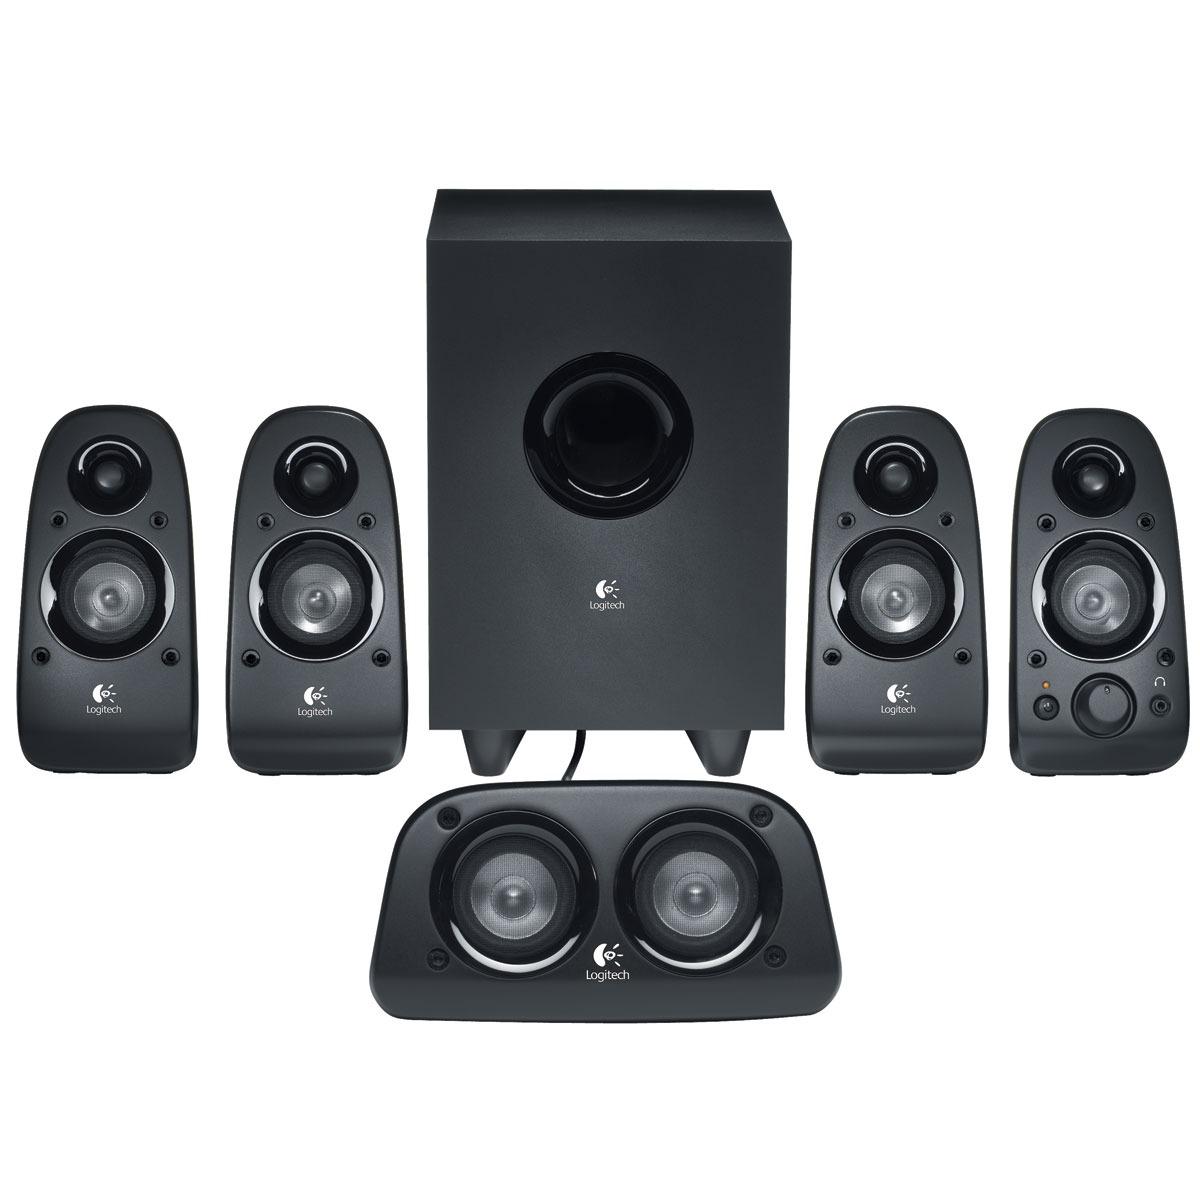 logitech speaker system z506 enceinte pc logitech sur ldlc. Black Bedroom Furniture Sets. Home Design Ideas